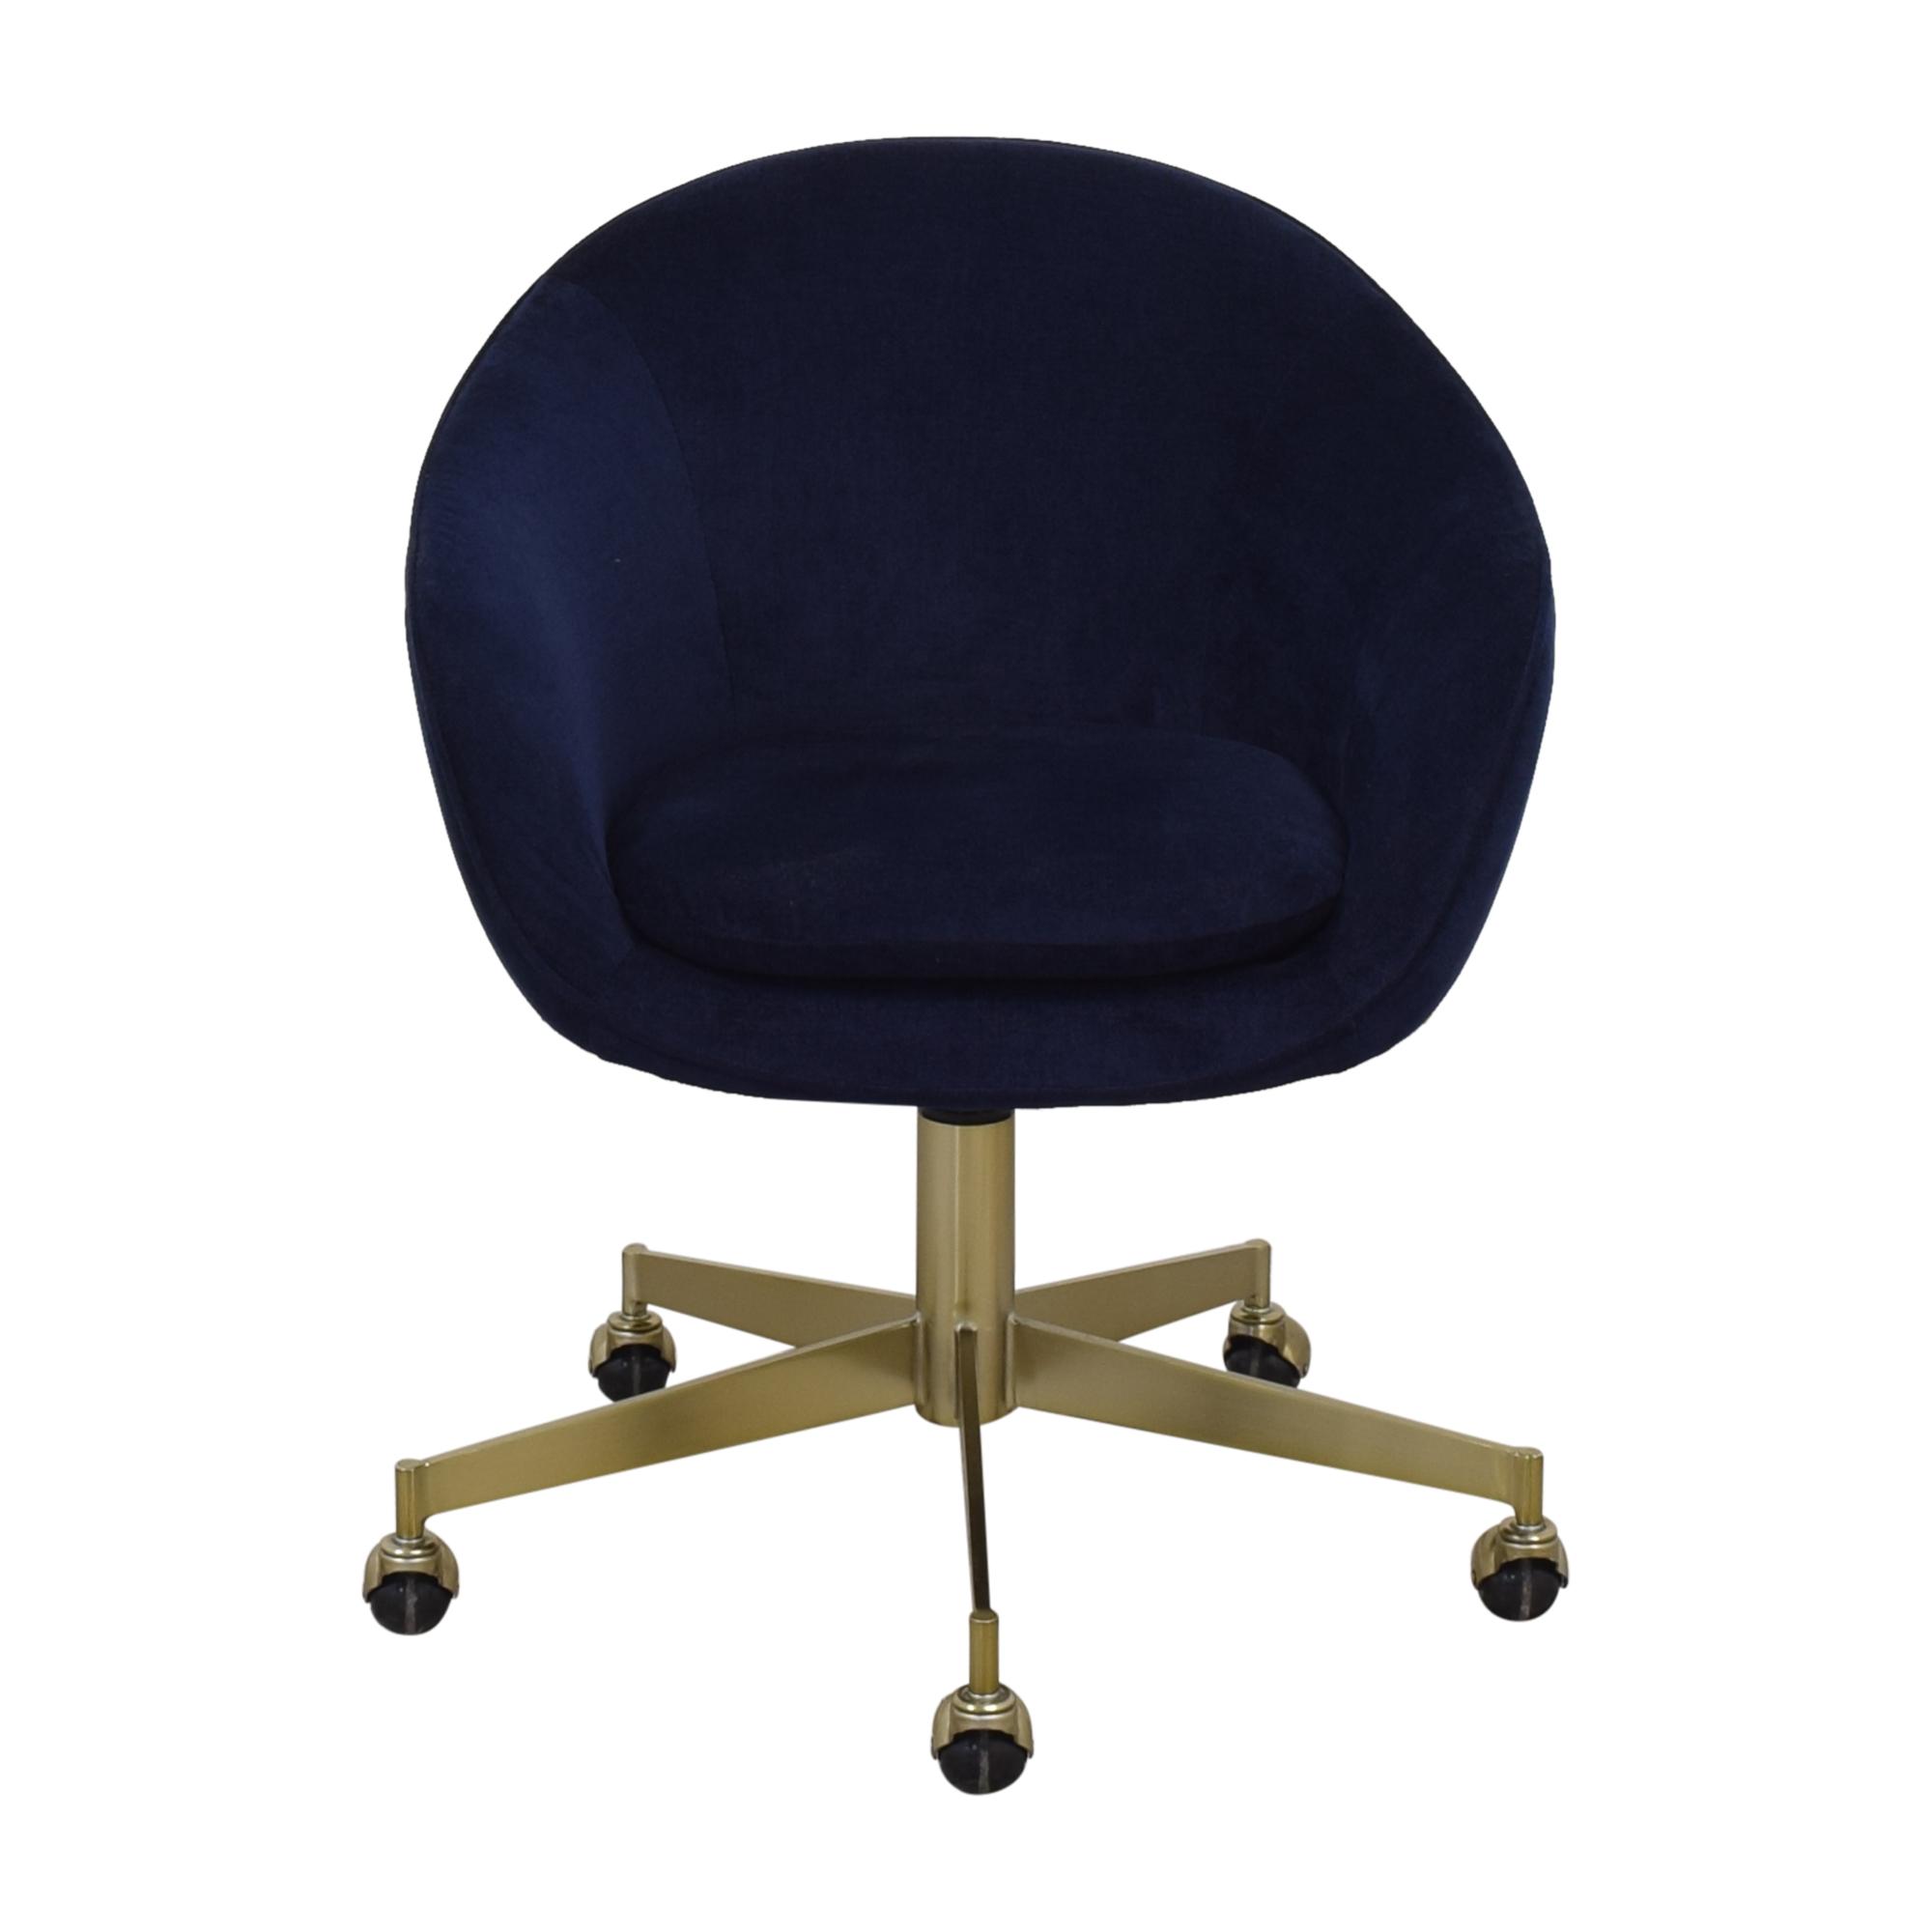 West Elm West Elm Alys Swivel Office Chair